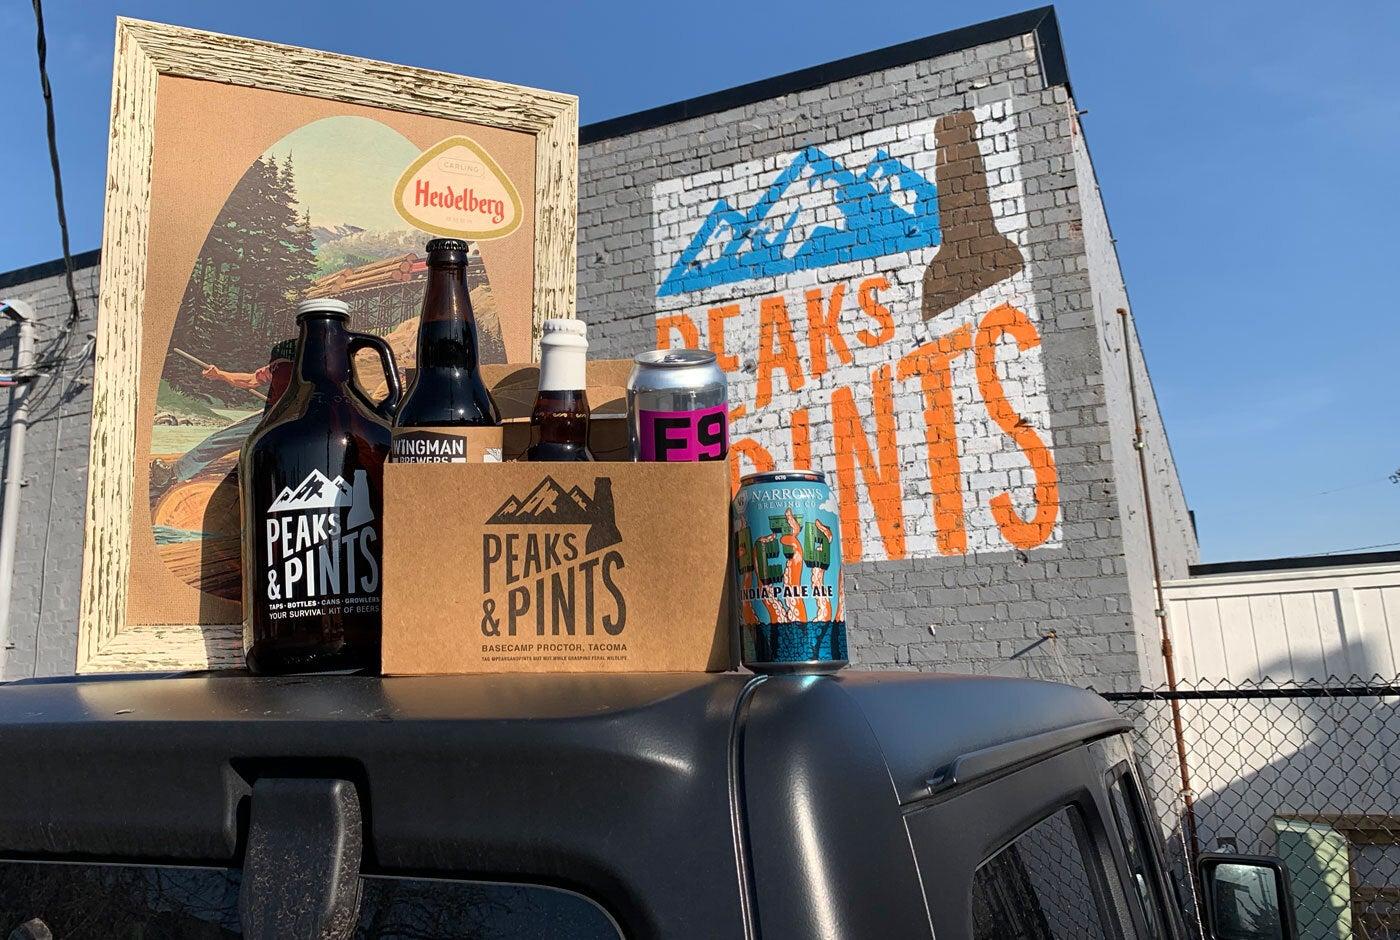 Peaks and Pints beers and growlers